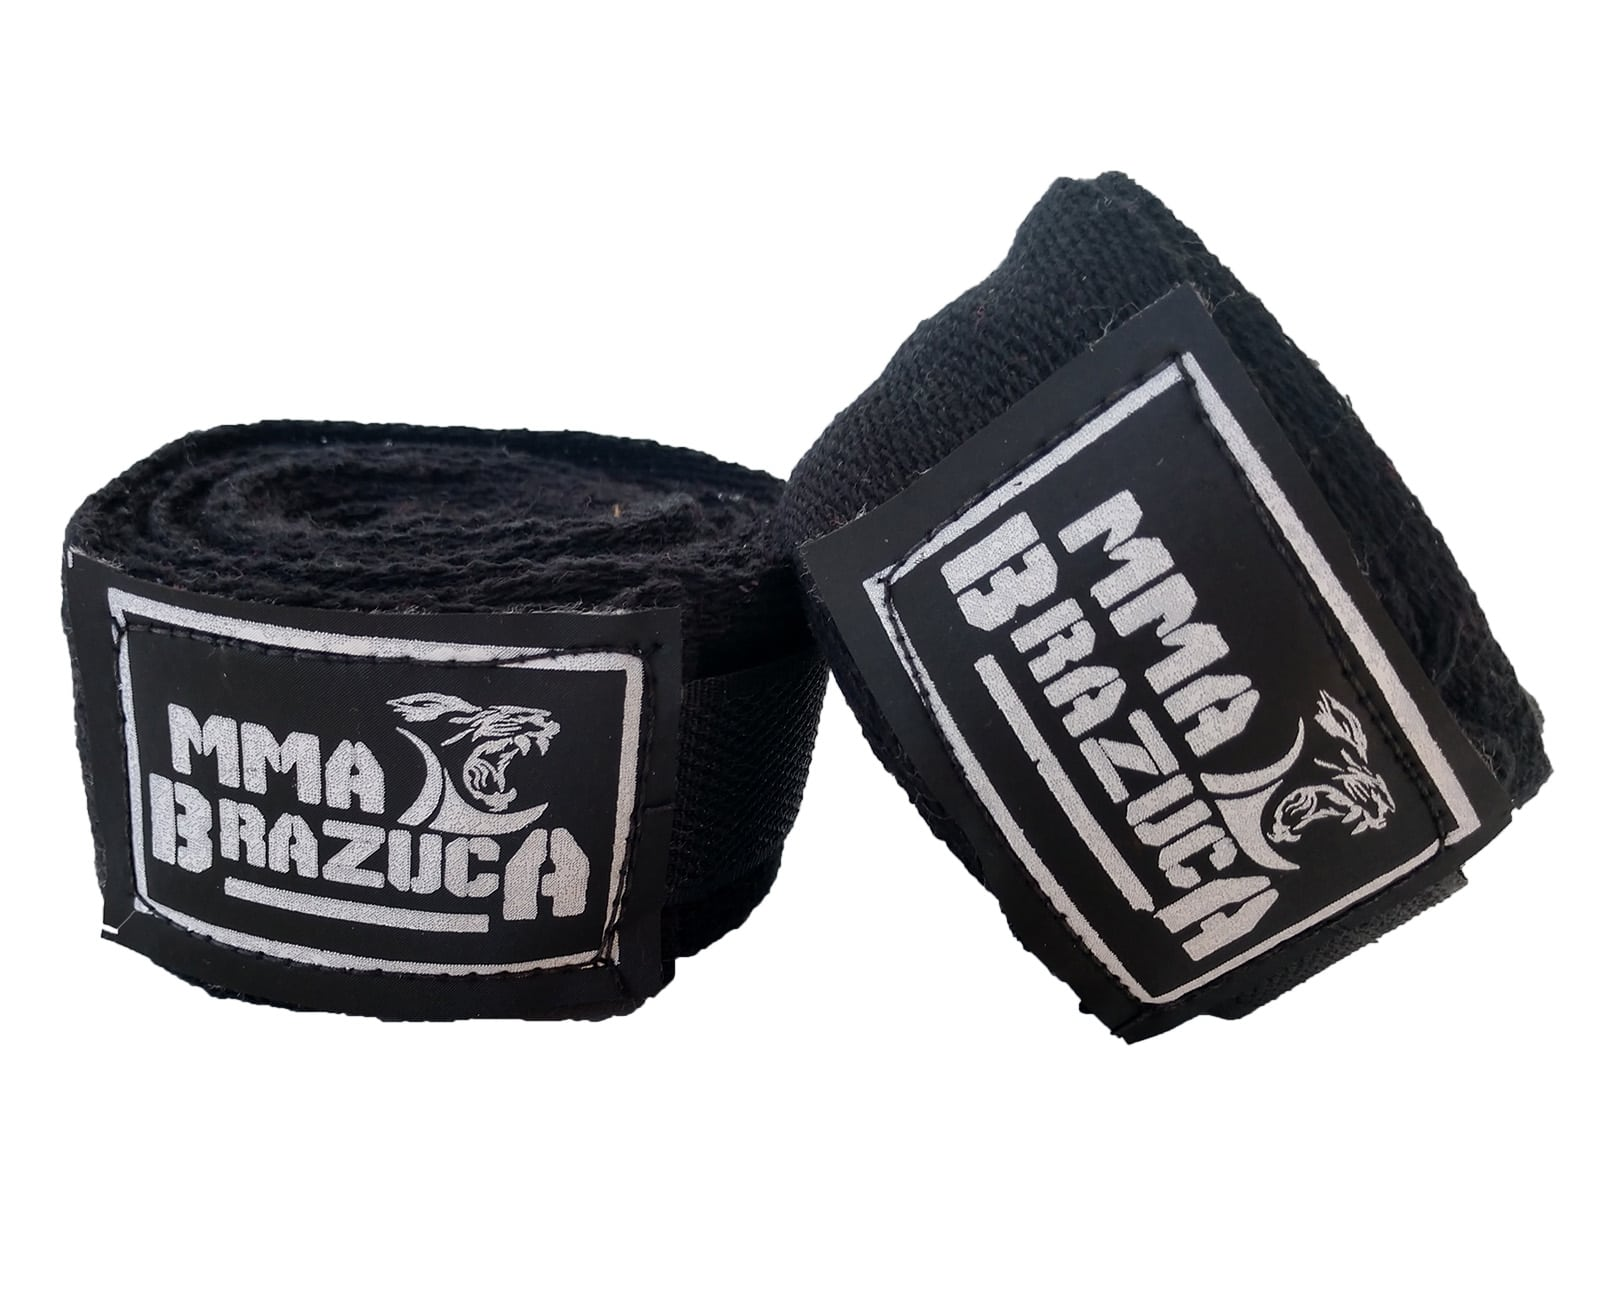 Kit de Boxe / Muay Thai 14oz - Preto com Branco - MMA Brazuka  - PRALUTA SHOP